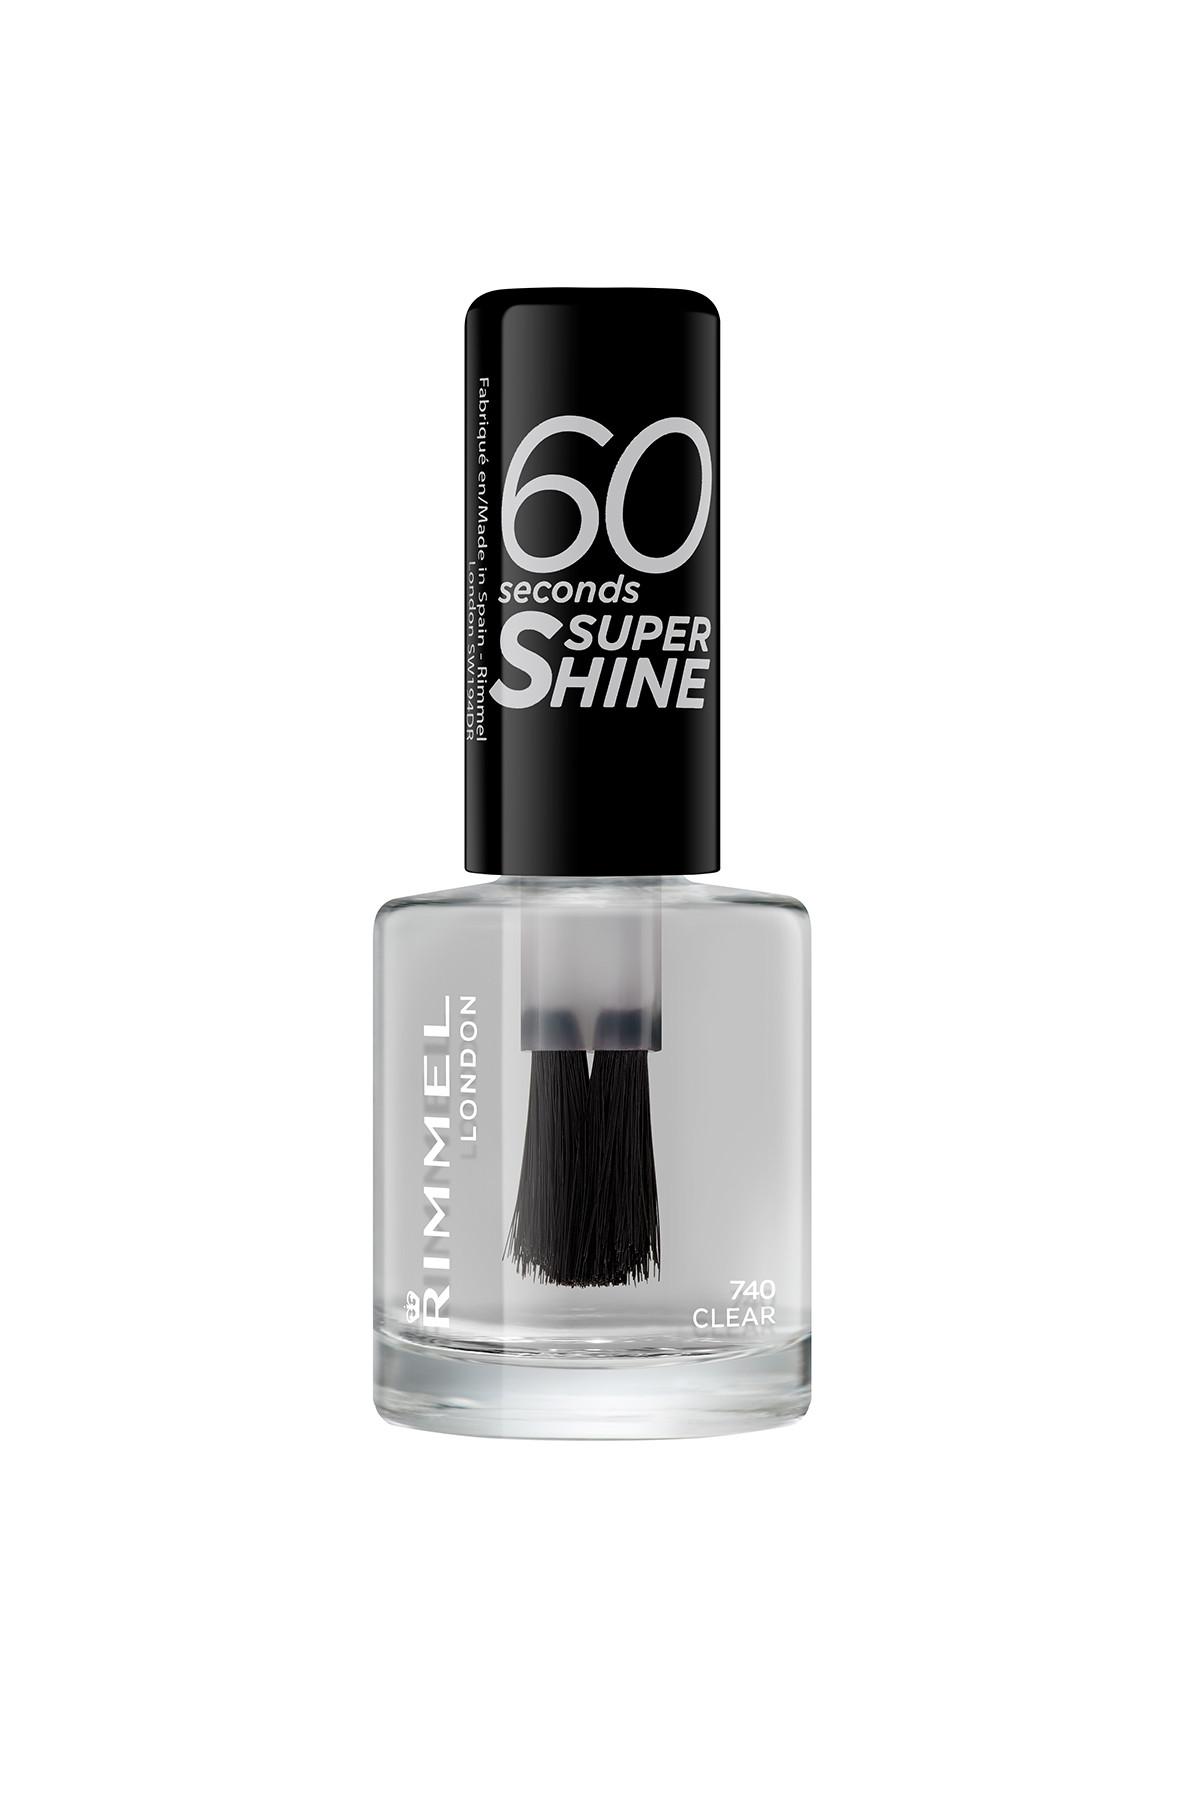 RIMMEL LONDON Oje - 60 Seconds Super Shine 740 Clear 3614220617183 1